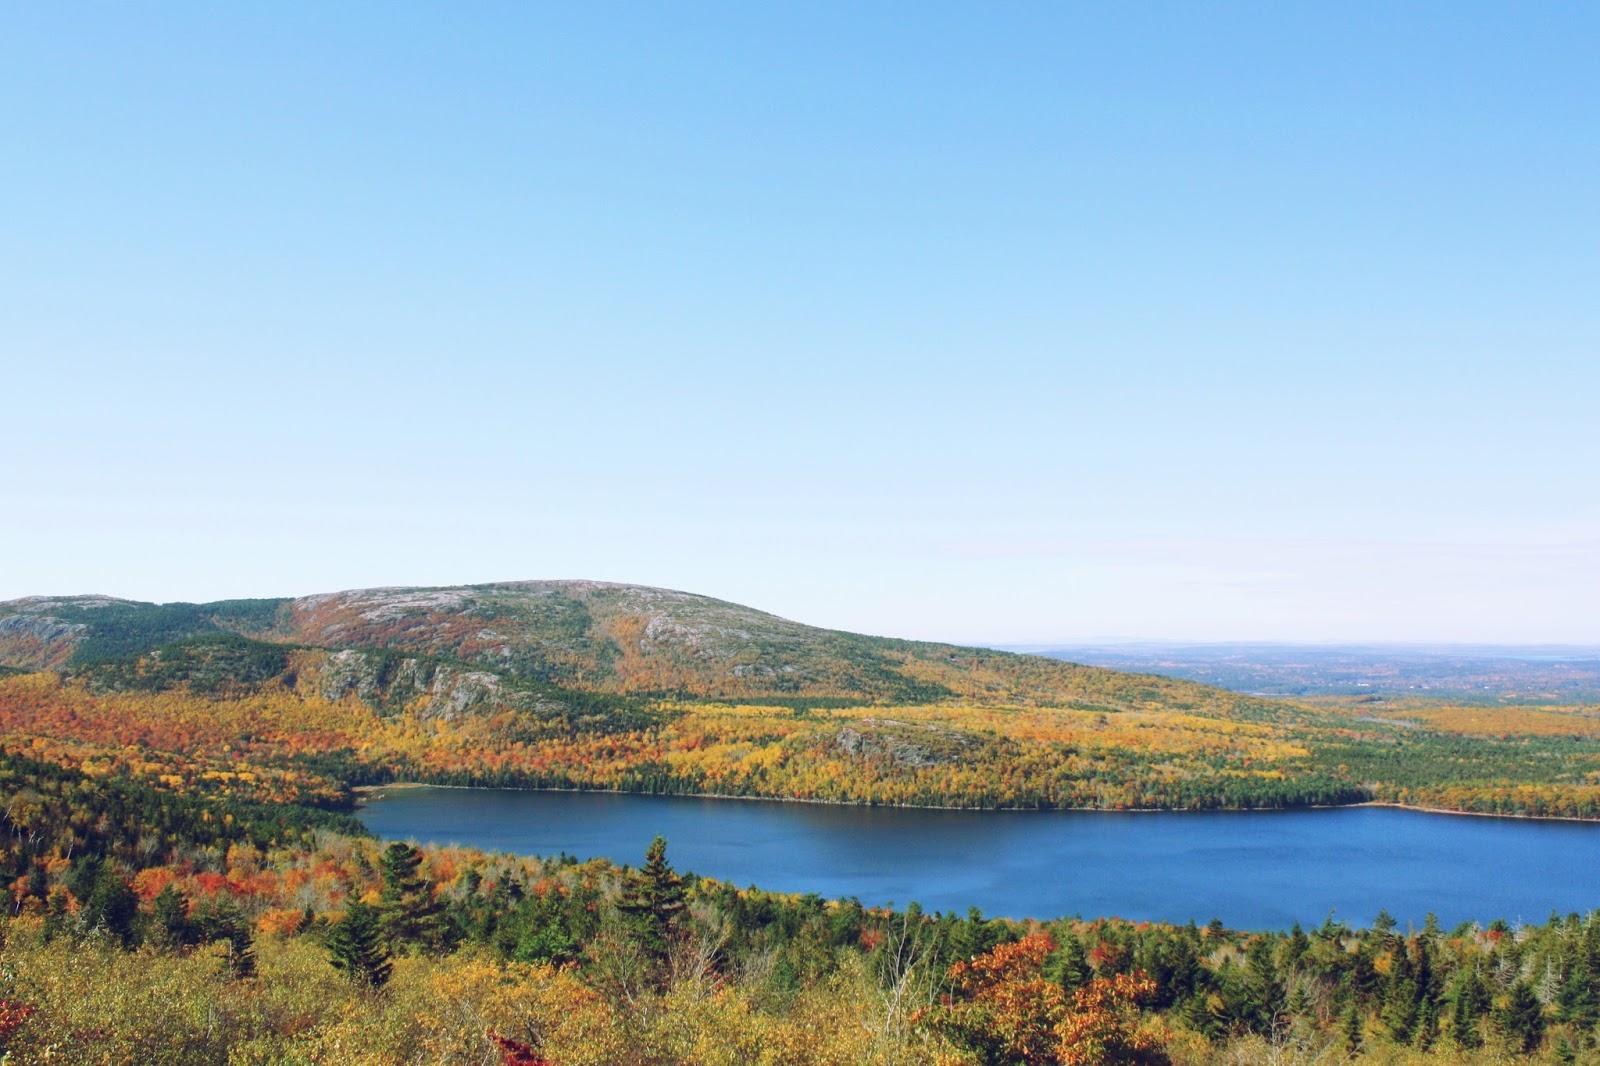 Acadia National Park autumn fall foliage